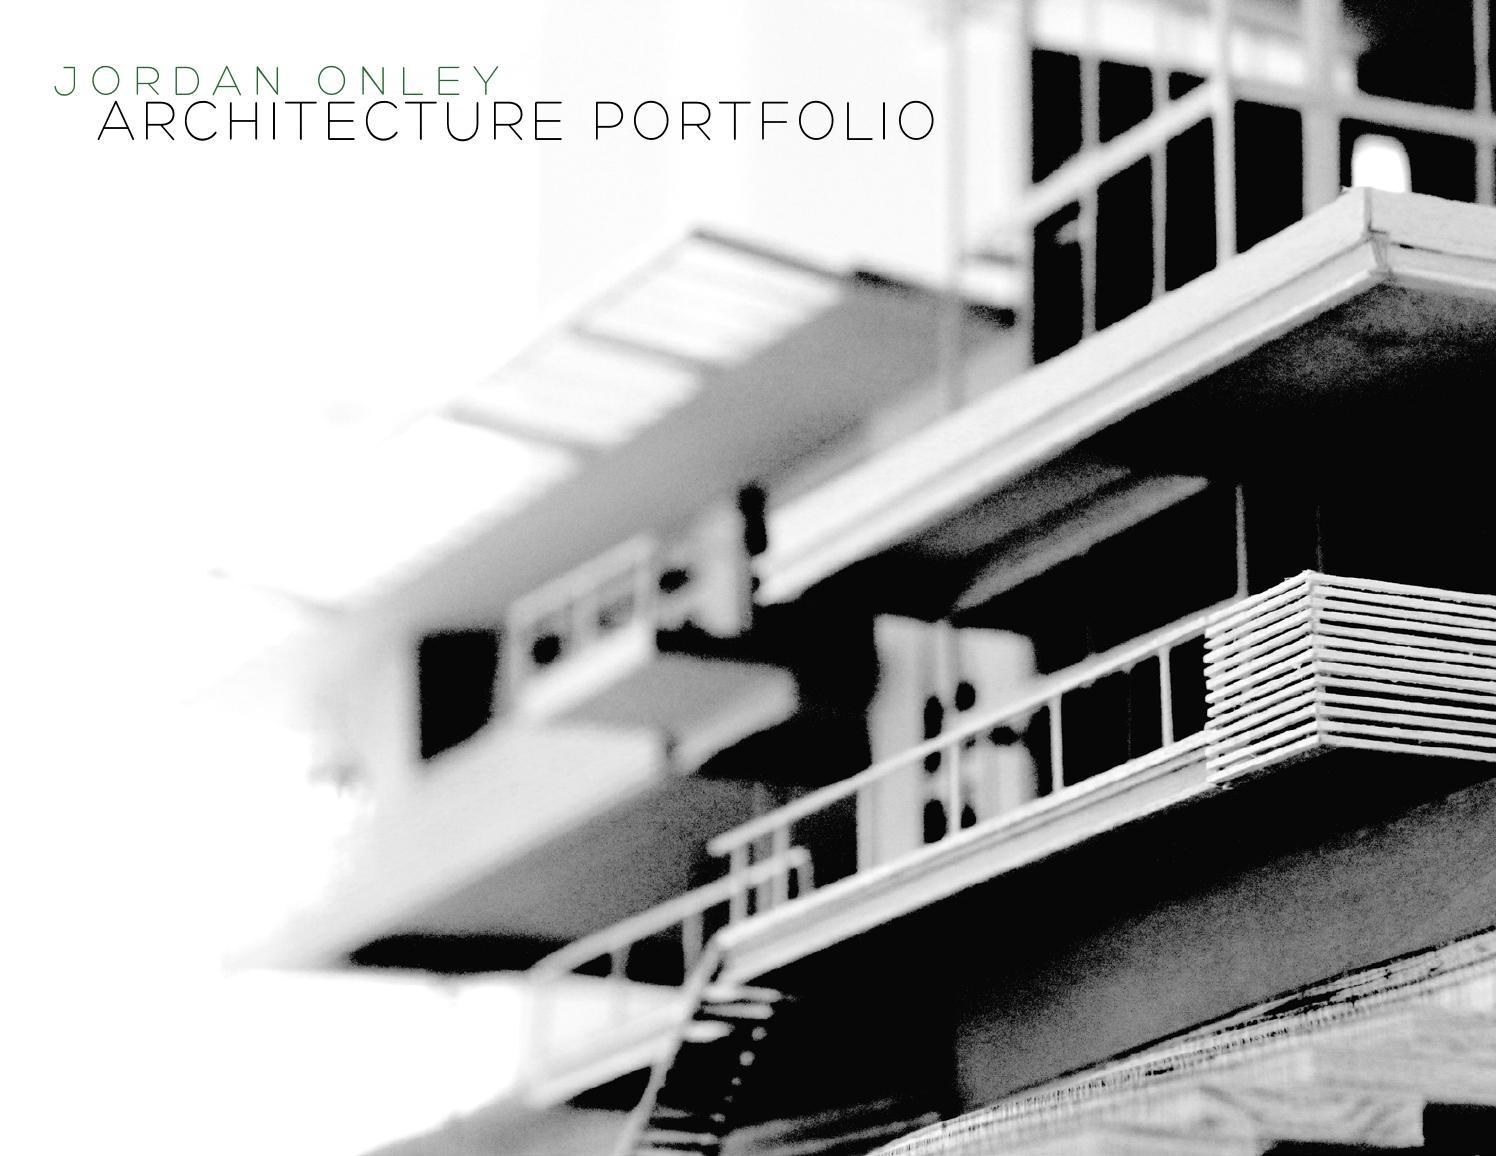 jordan onley architecture portfolio by jordan onley